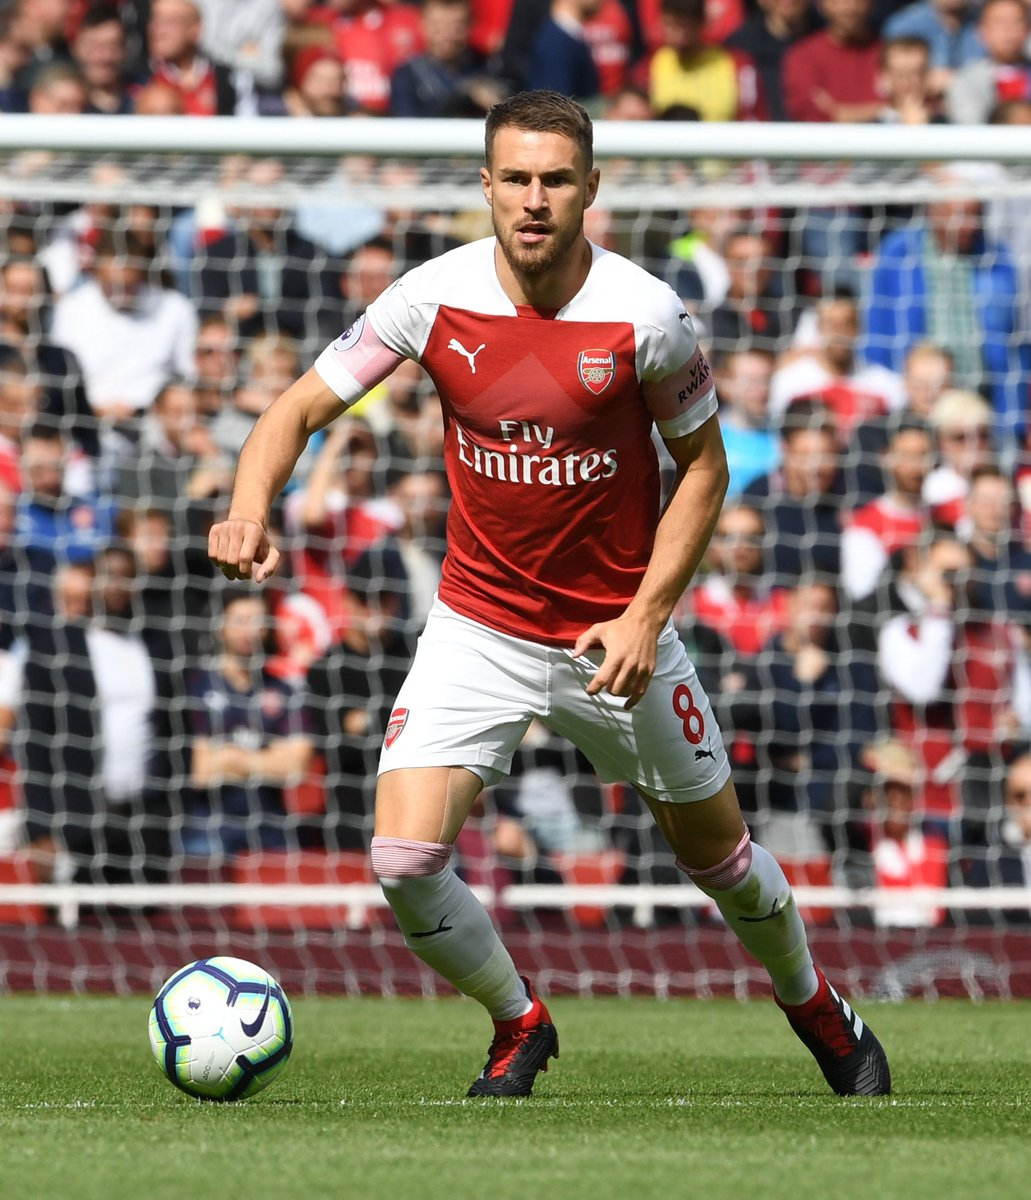 59b8dd9be4e Arsenal FC on Twitter